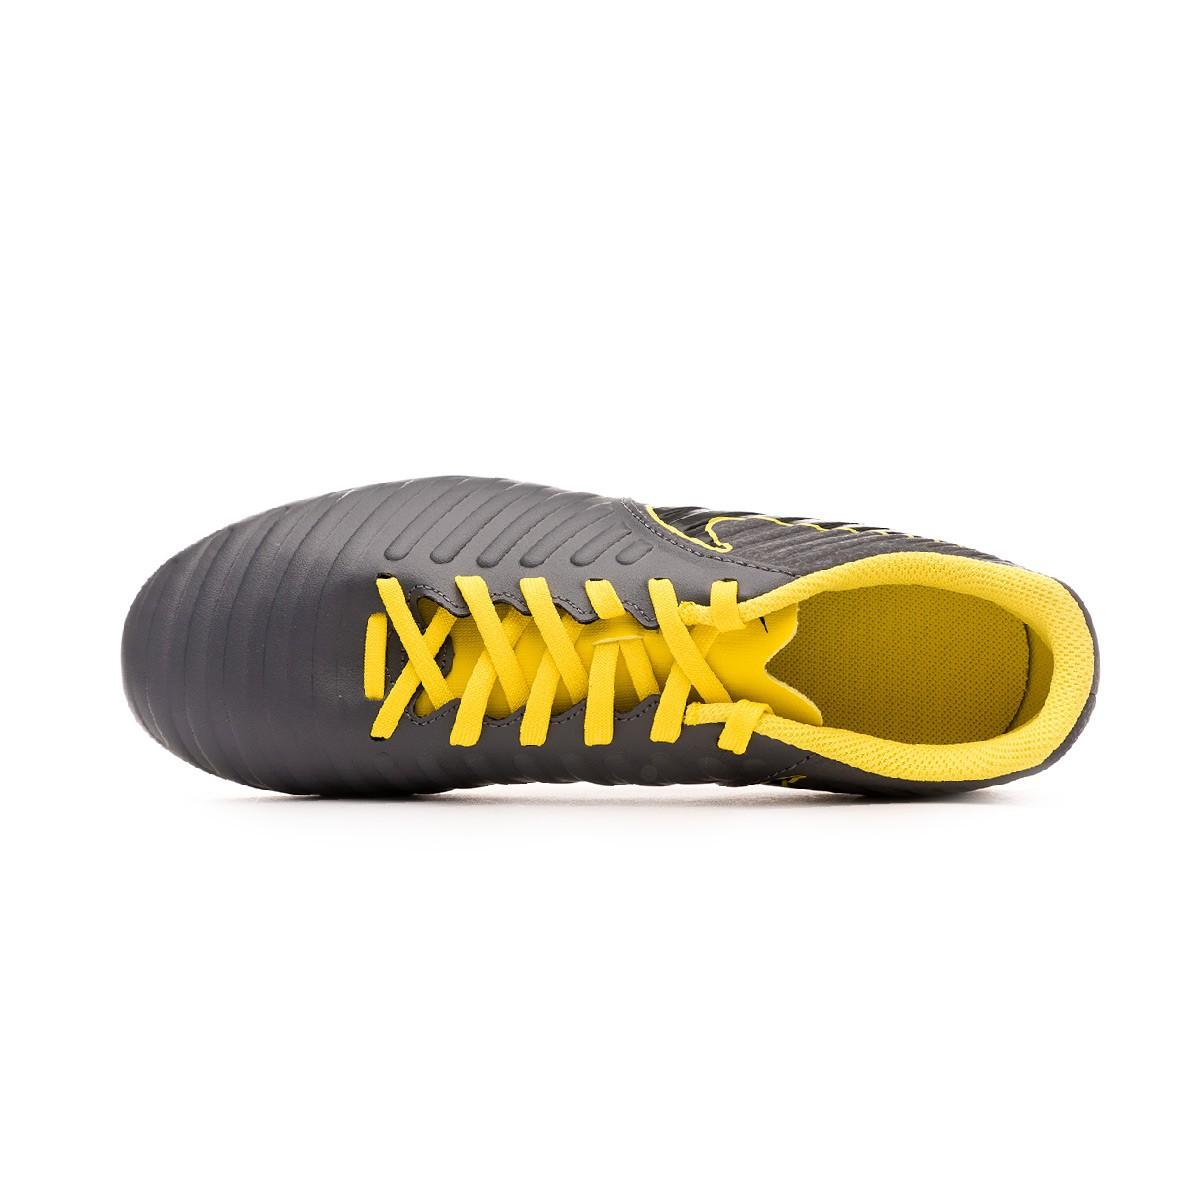 cedfce78cc3 Football Boots Nike Tiempo Legend VII Club MG Dark grey-Black-Optical yellow  - Tienda de fútbol Fútbol Emotion